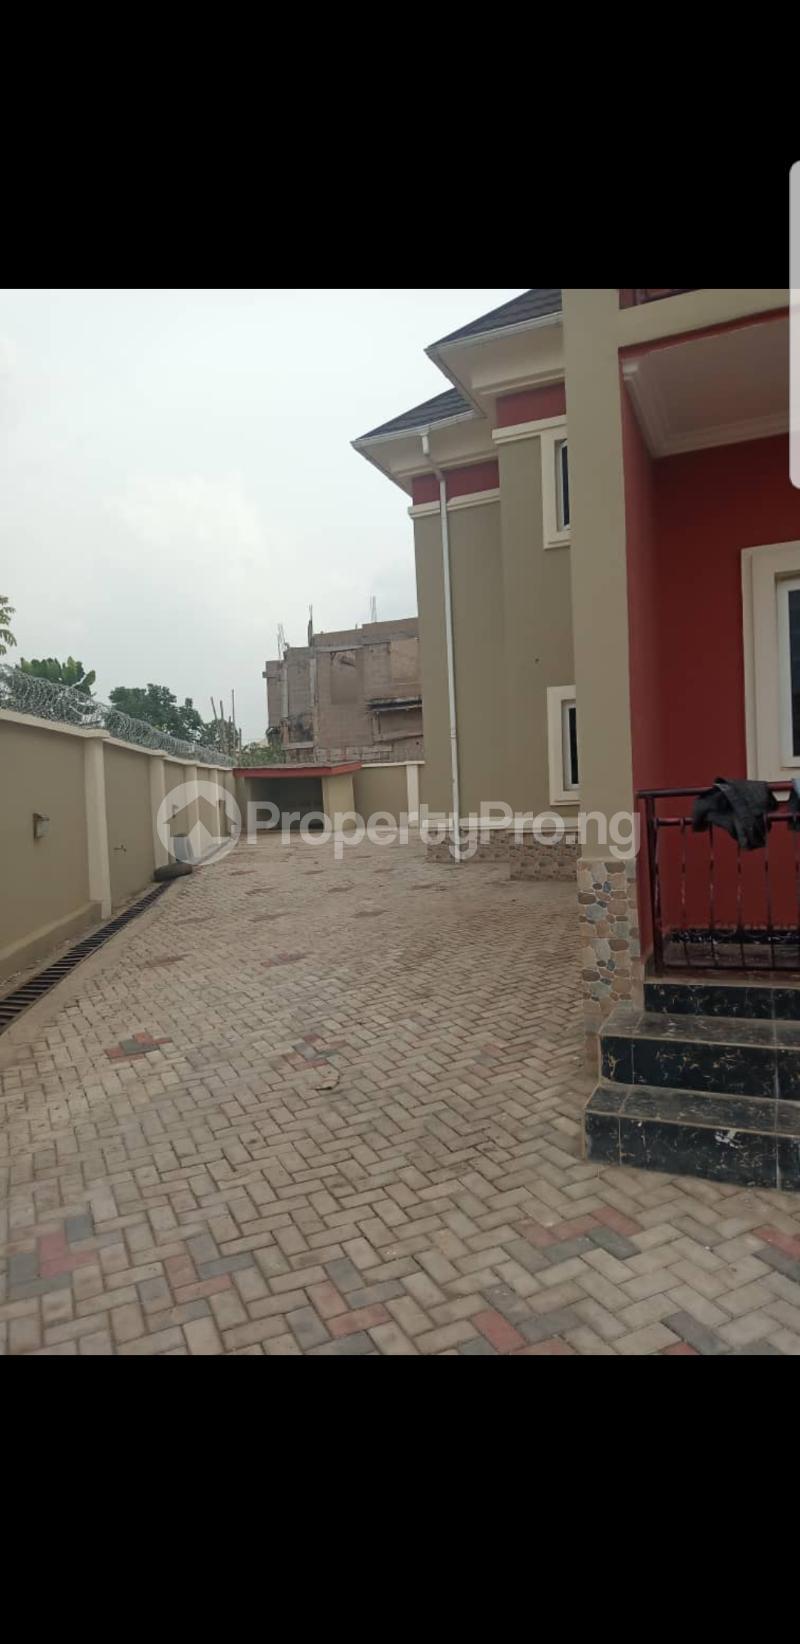 3 bedroom Shared Apartment Flat / Apartment for rent Enugu Enugu - 9